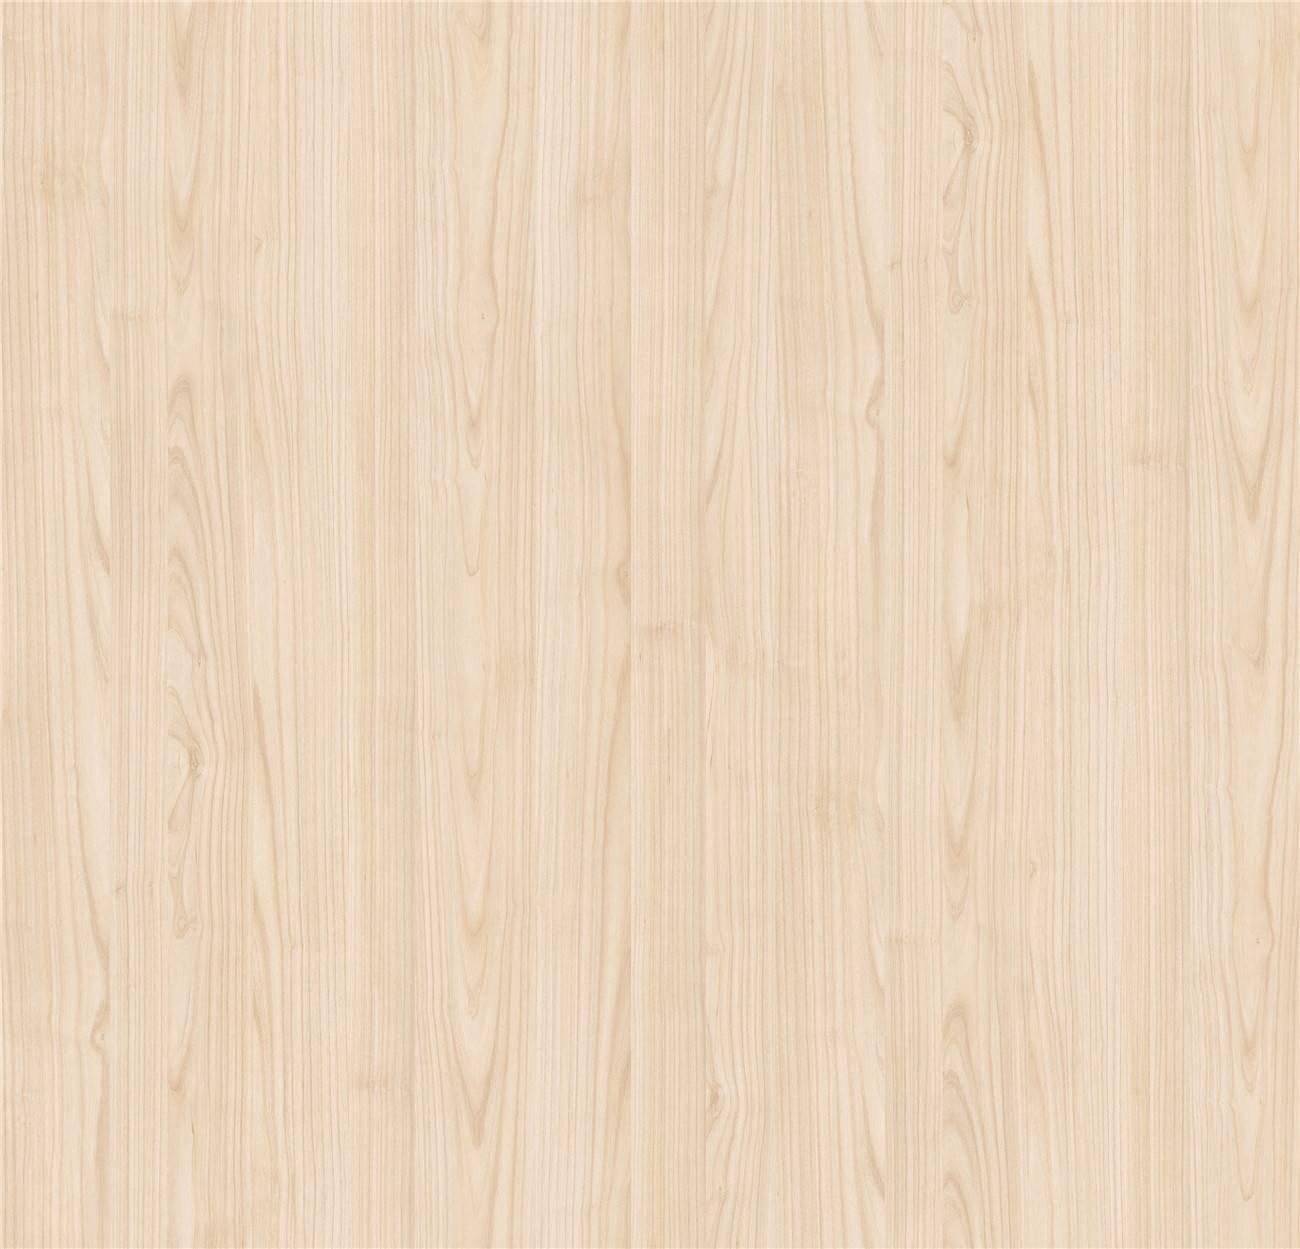 I.DECOR ID9001 Vermont Cherry ID Series 2017 image41